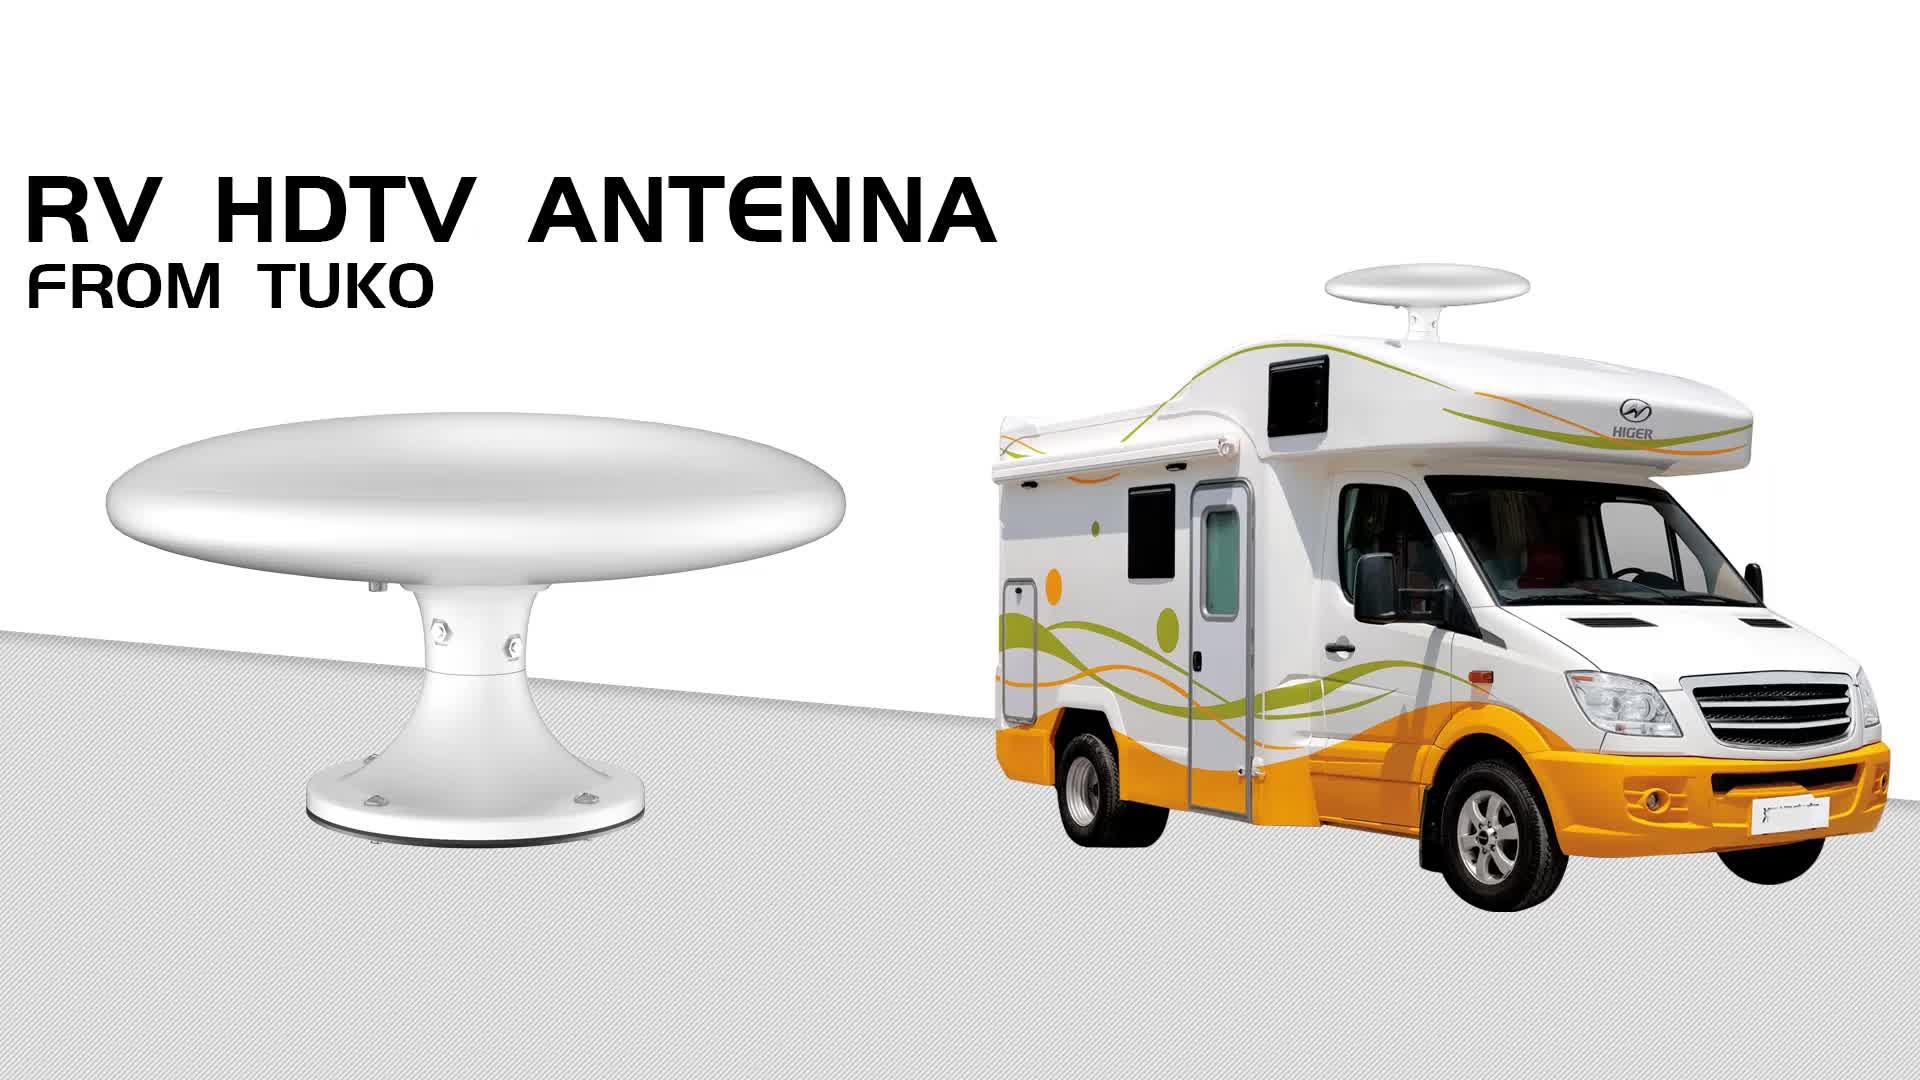 Wholesale the newest omni-directional waterproof 1080P 4K Free digital fm vhf uhf outdoor RV TV antenna